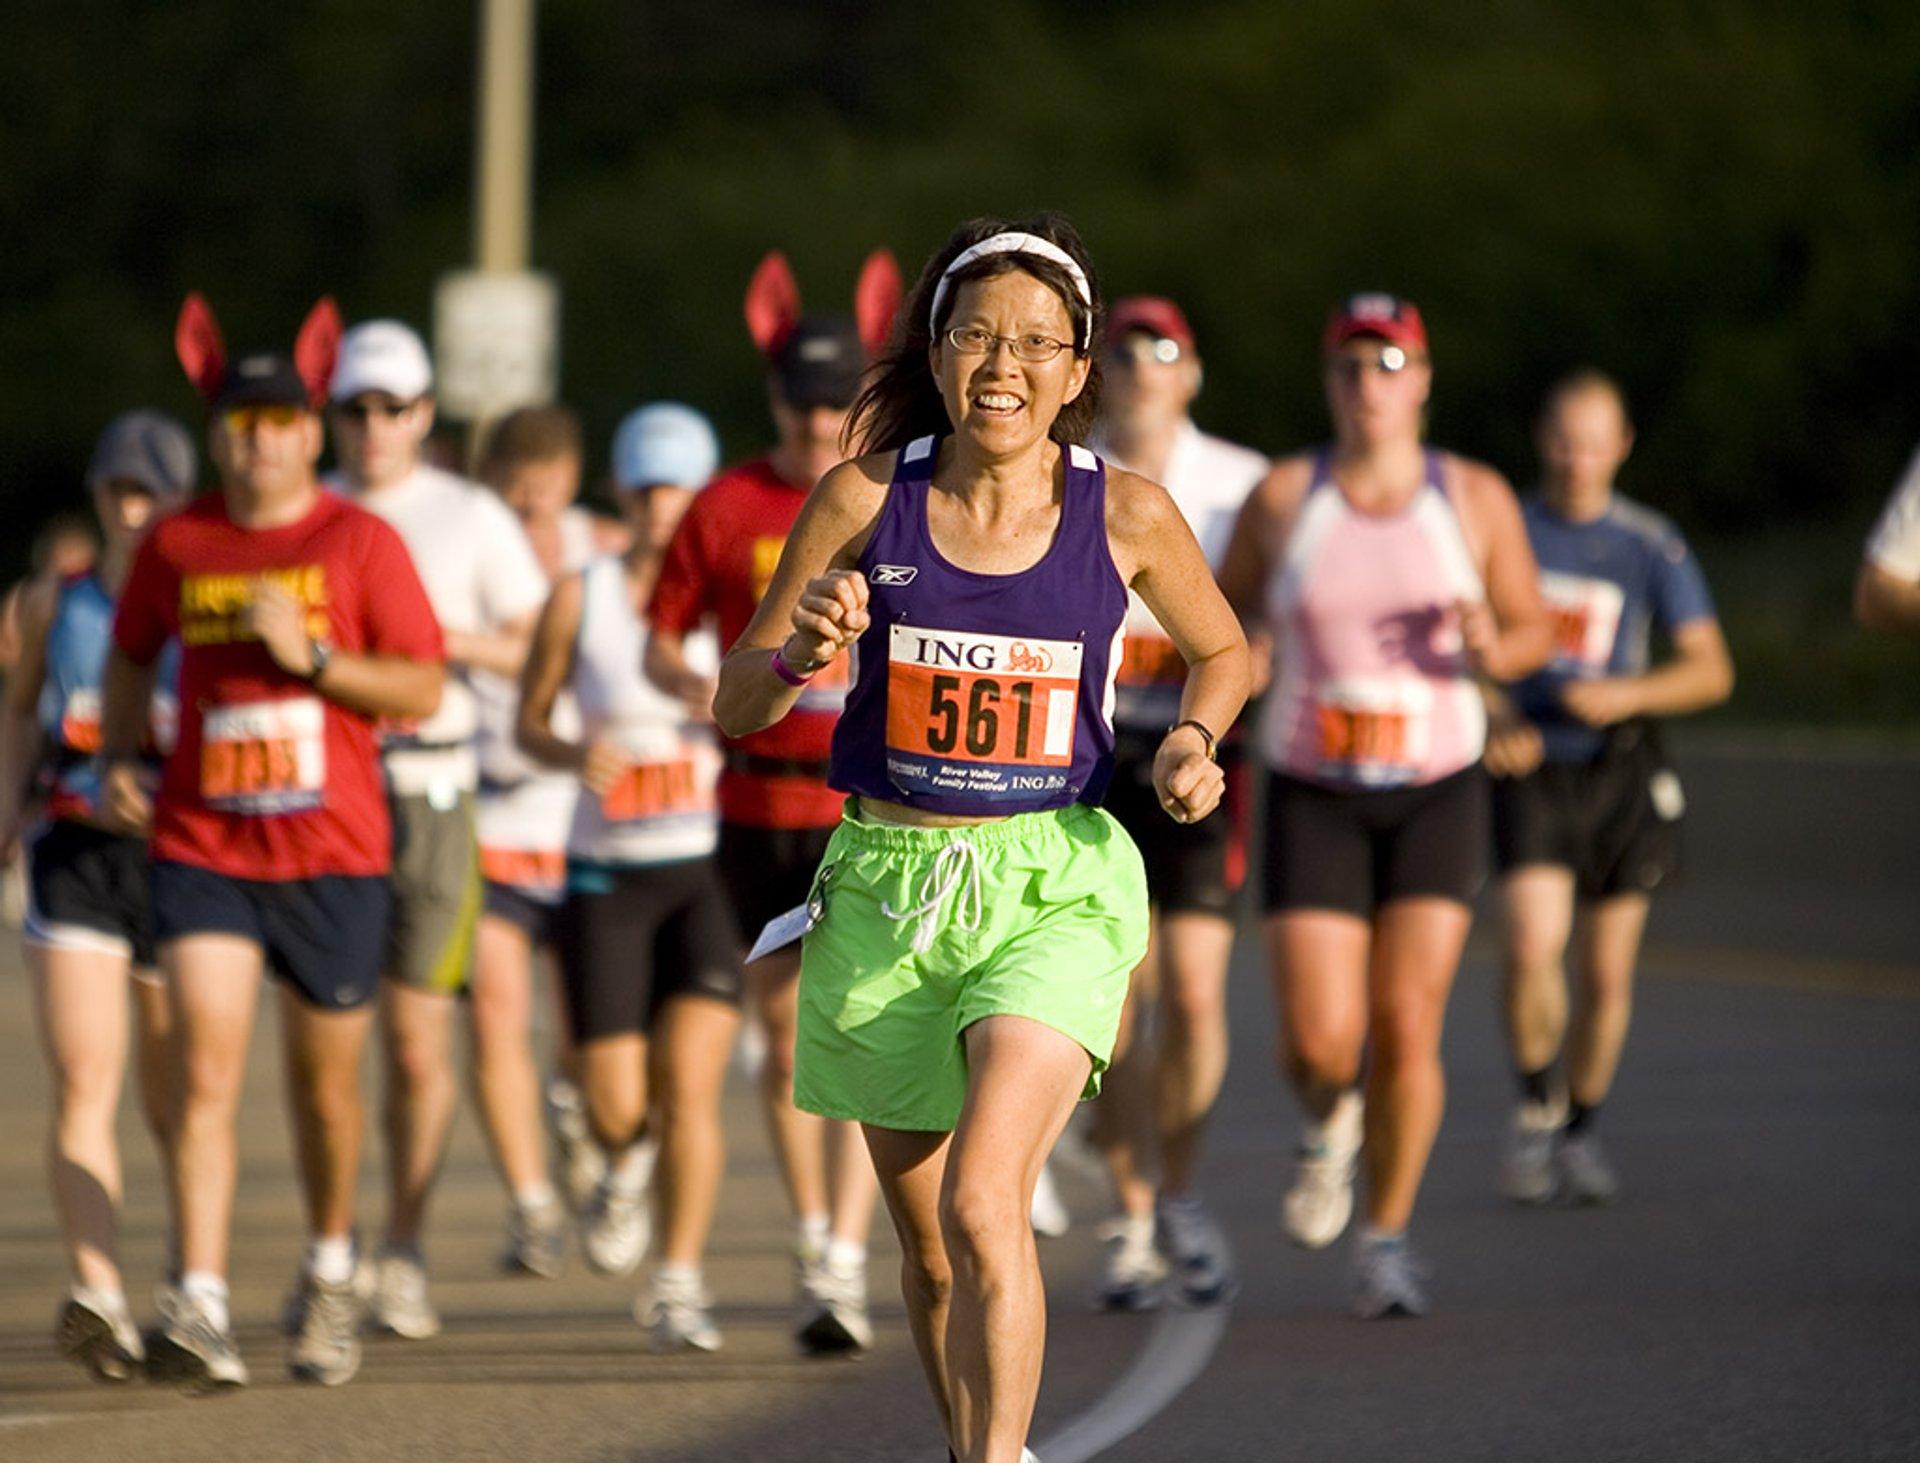 Edmonton Marathon in Edmonton 2020 - Best Time